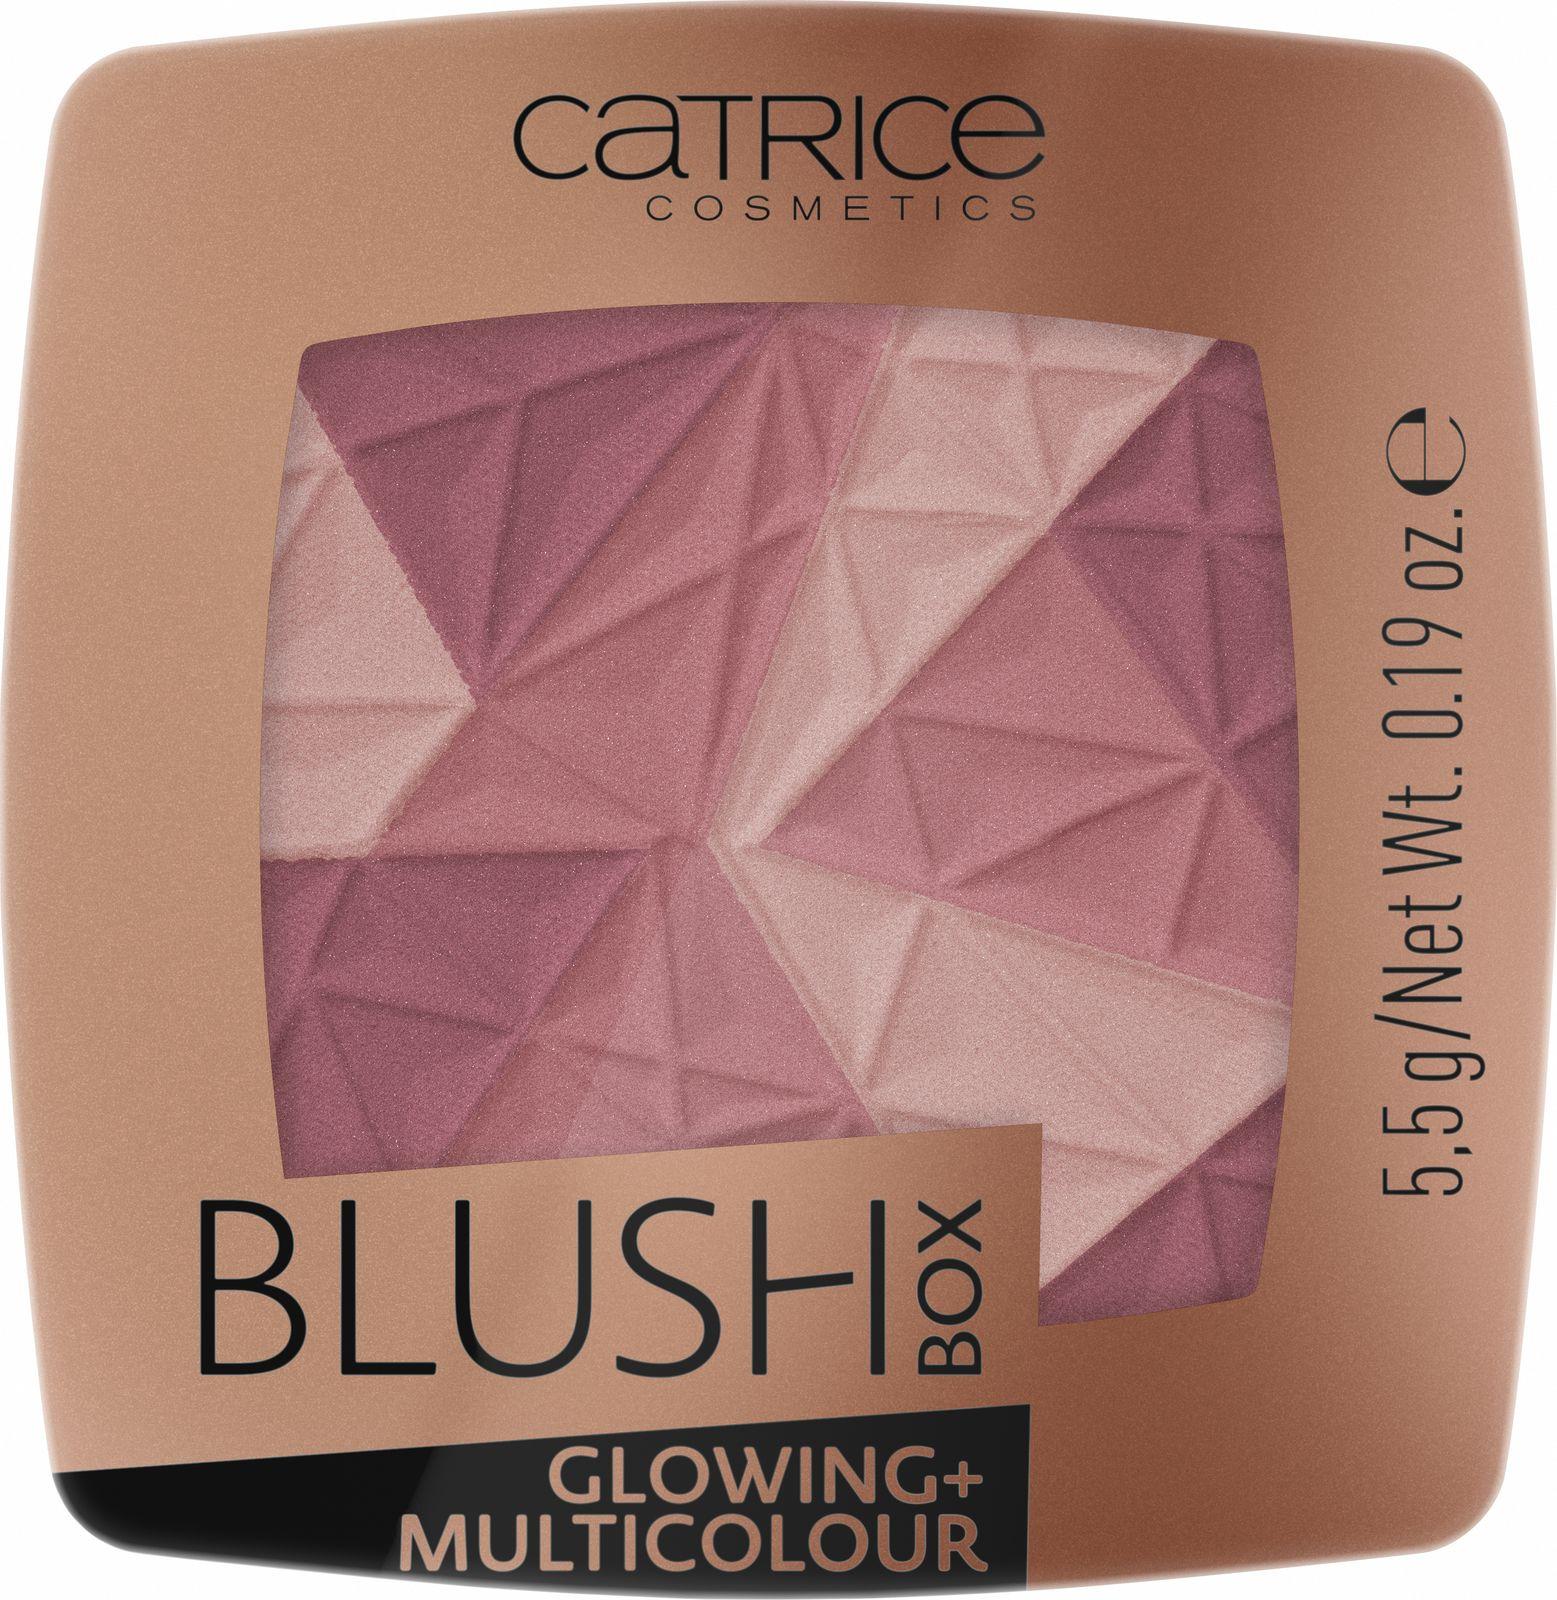 Румяна Catrice Blush Box Growing + Multicolor, 020 It´s wine o´clock